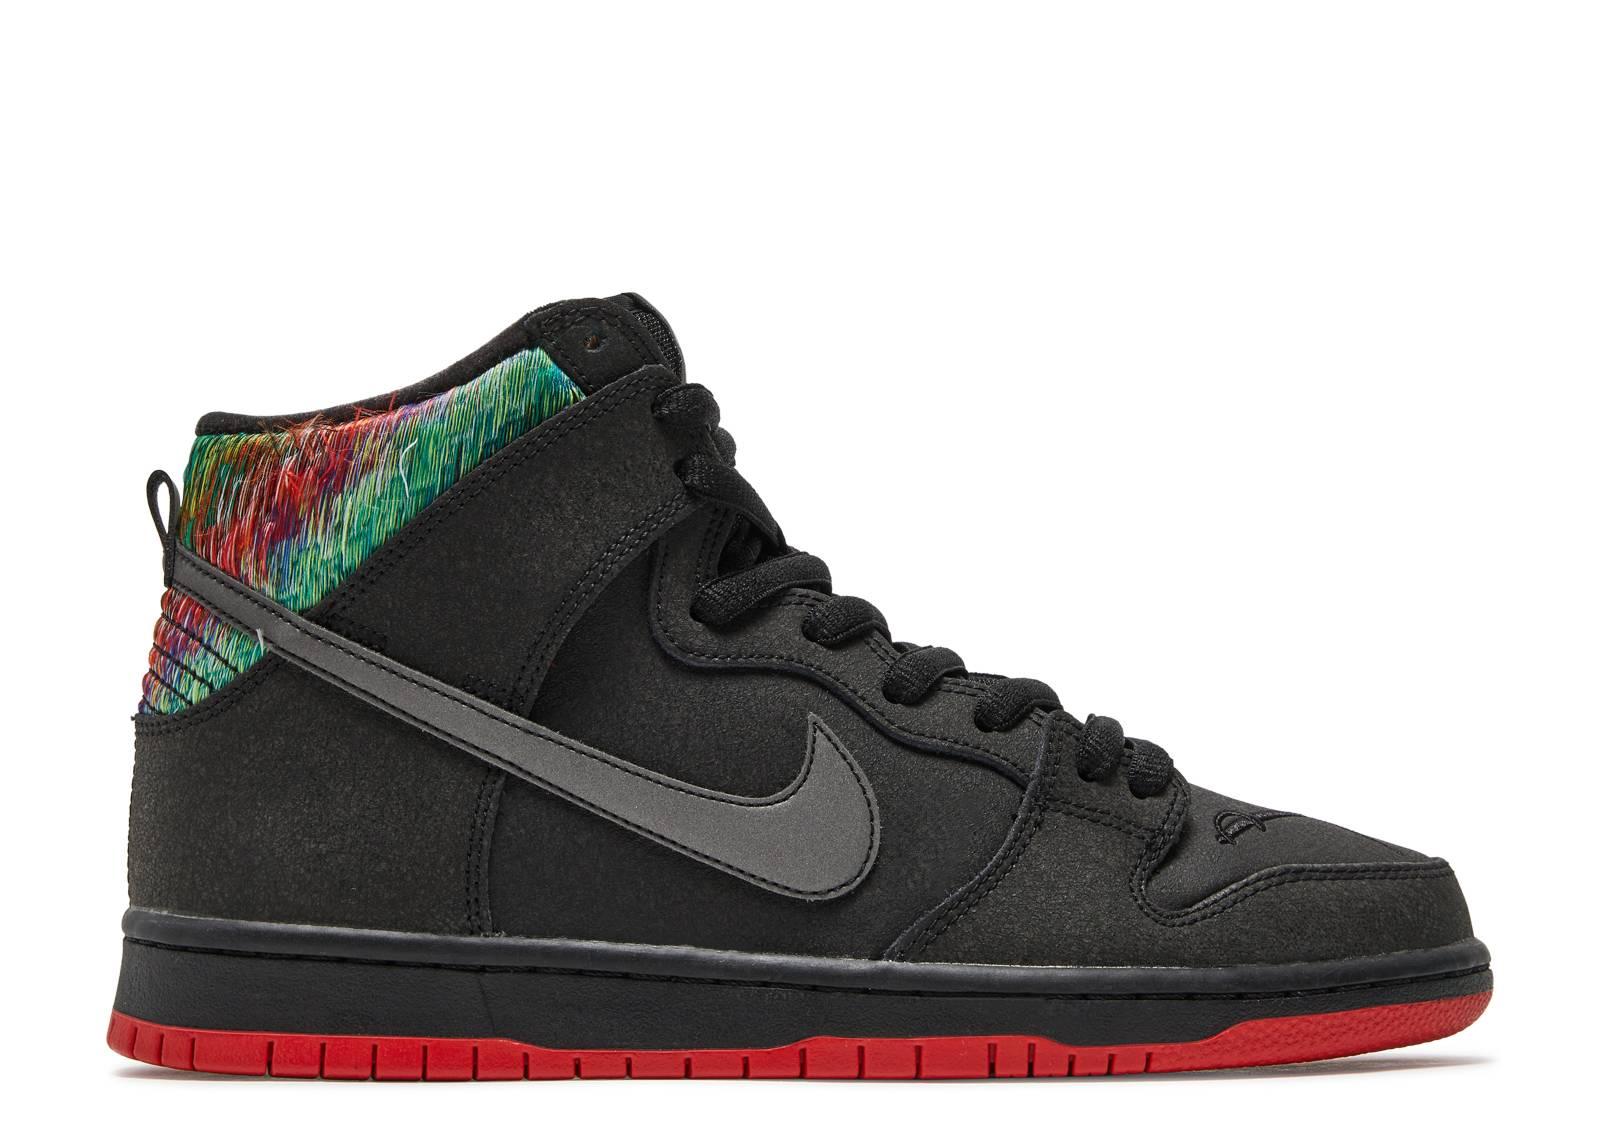 nike air max chaussures de force - nike-dunk-high-premium-sb-gasparilla-black-blk-chilling-rd-mtllc-slvr-081317_1.jpg